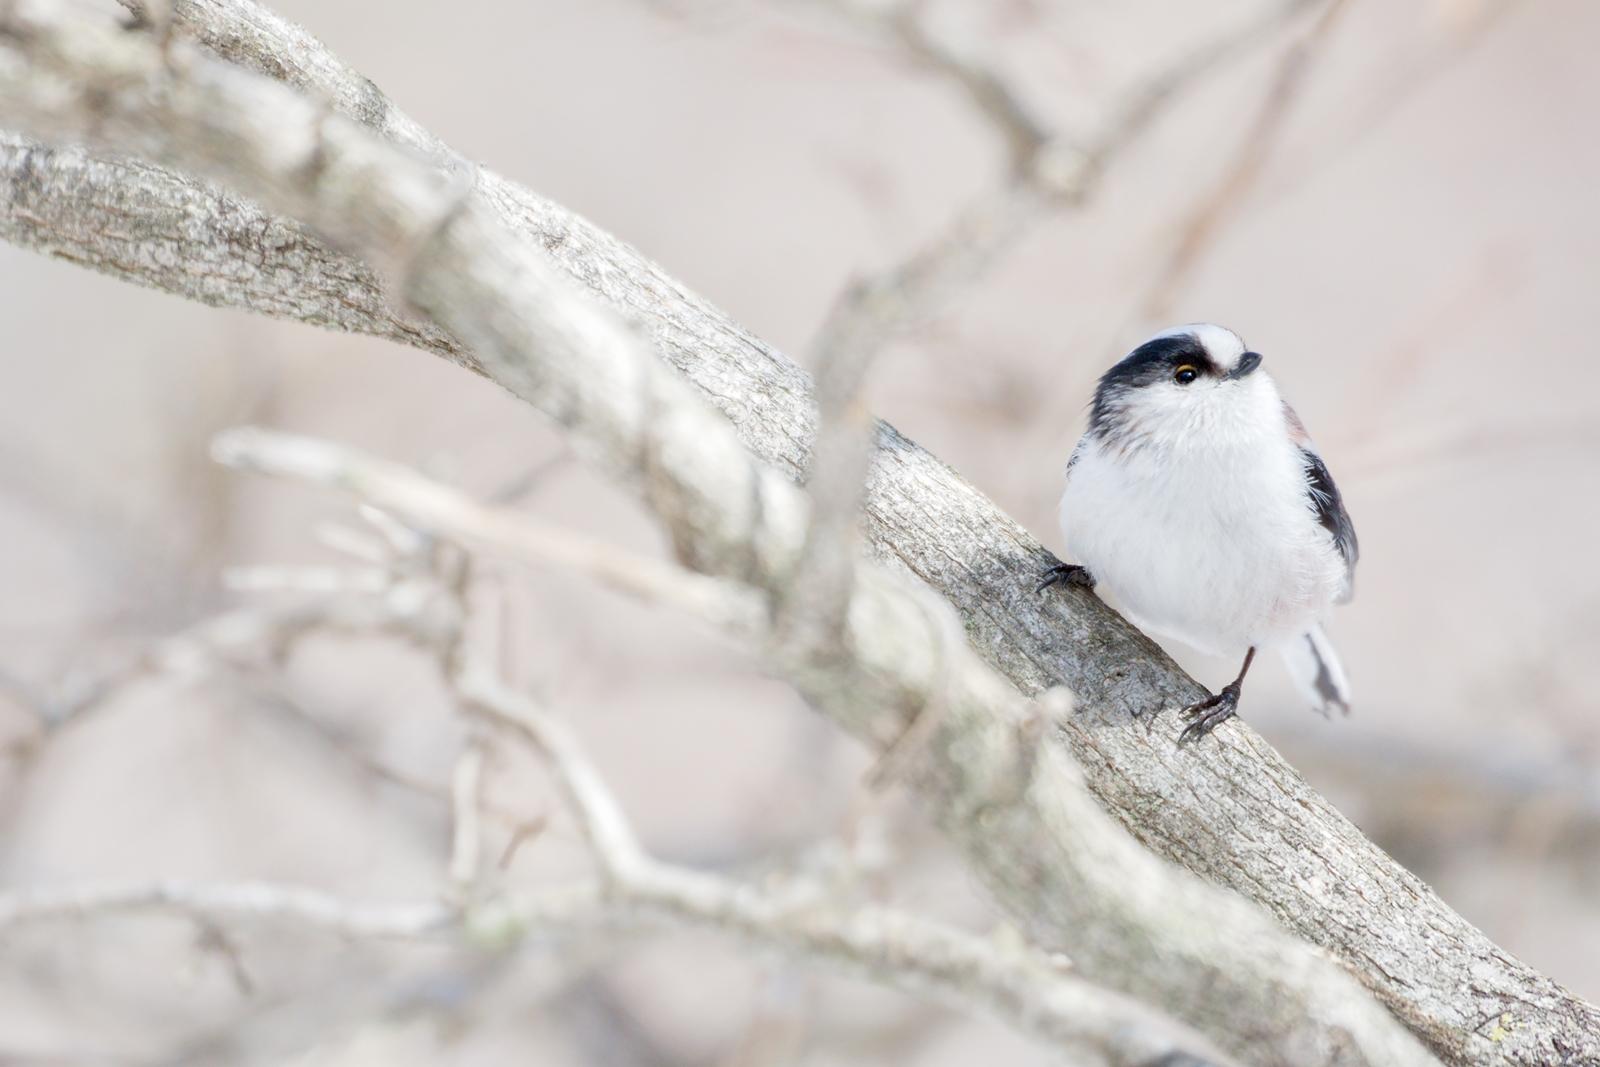 Photo: 春移ろう Feel a change in the spring.  もう少し 君のところへも もう少し 暖かく穏やかな季節 少しずつ移ろいでいく  Long-tailed Tit. (高原で出会ったエナガ)  #cooljapan #365cooljapanmay  #birdphotography #birds  #sigma #kawaii   Nikon D7200 SIGMA APO 50-500mm F5-6.3 DG OS HSM [ Day323, March 31th ]  小鳥の詩朗読 https://youtu.be/KdsZLfiENuw?list=PL2YtHGm0-R3qVsaqvQe9OYdJFCkI98wzF